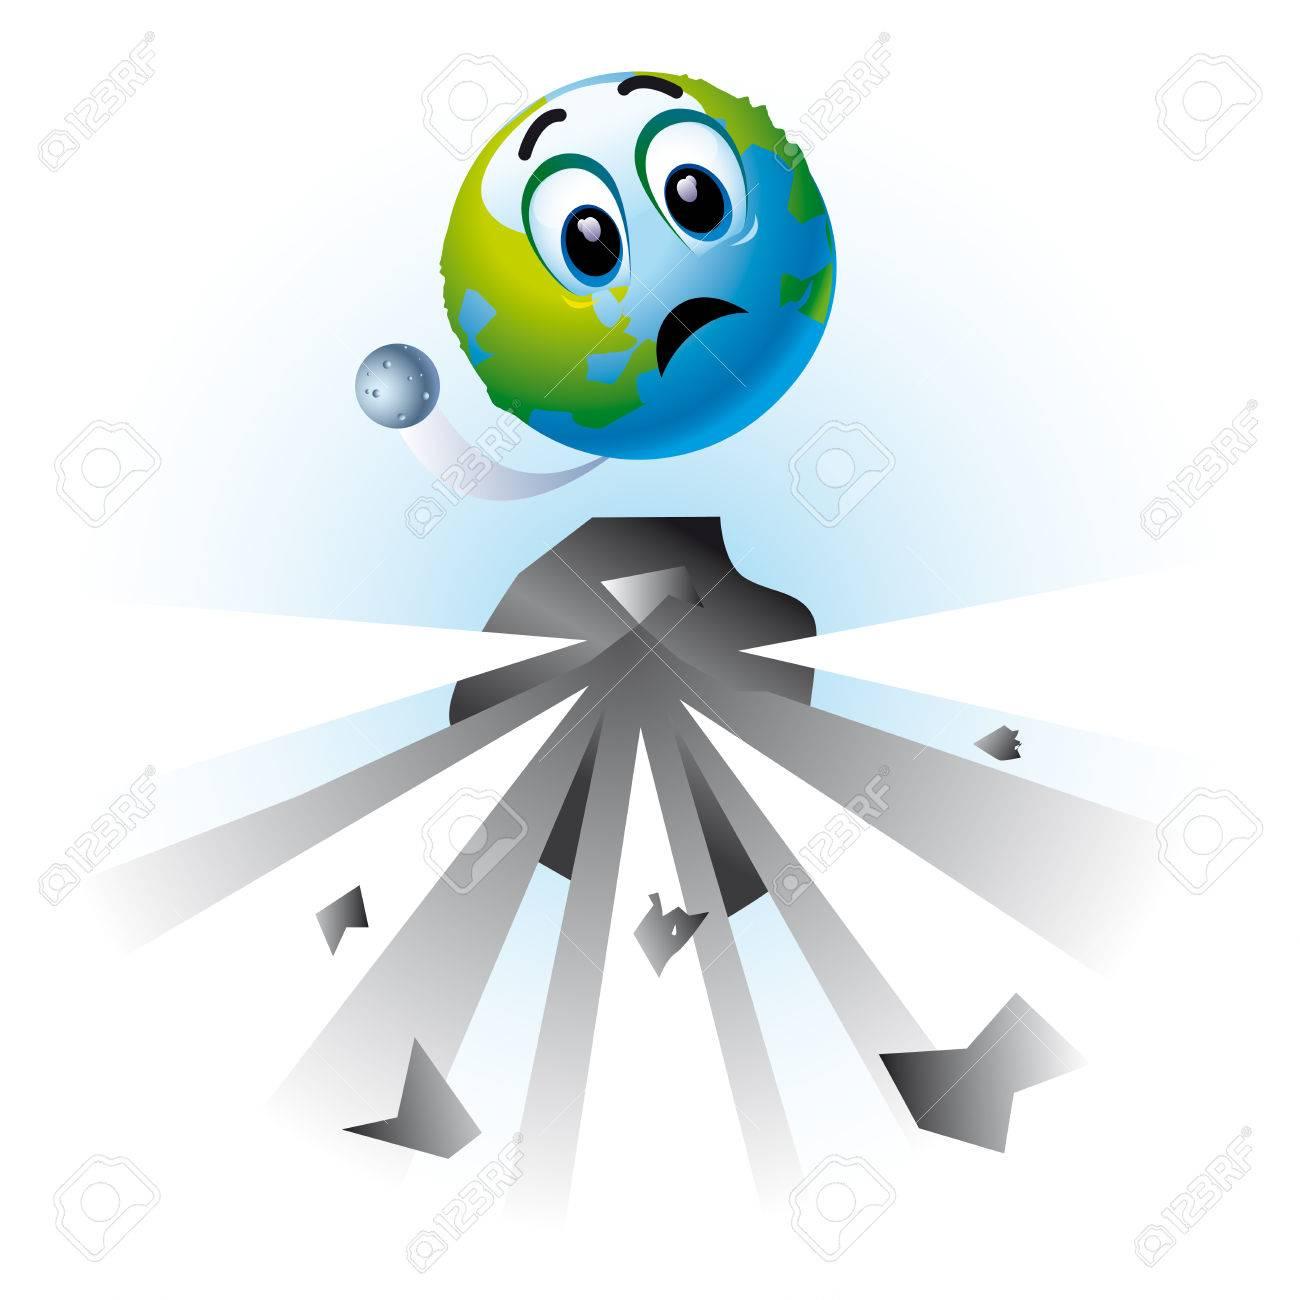 Smiling ball as Earth in danger Stock Vector - 4836638